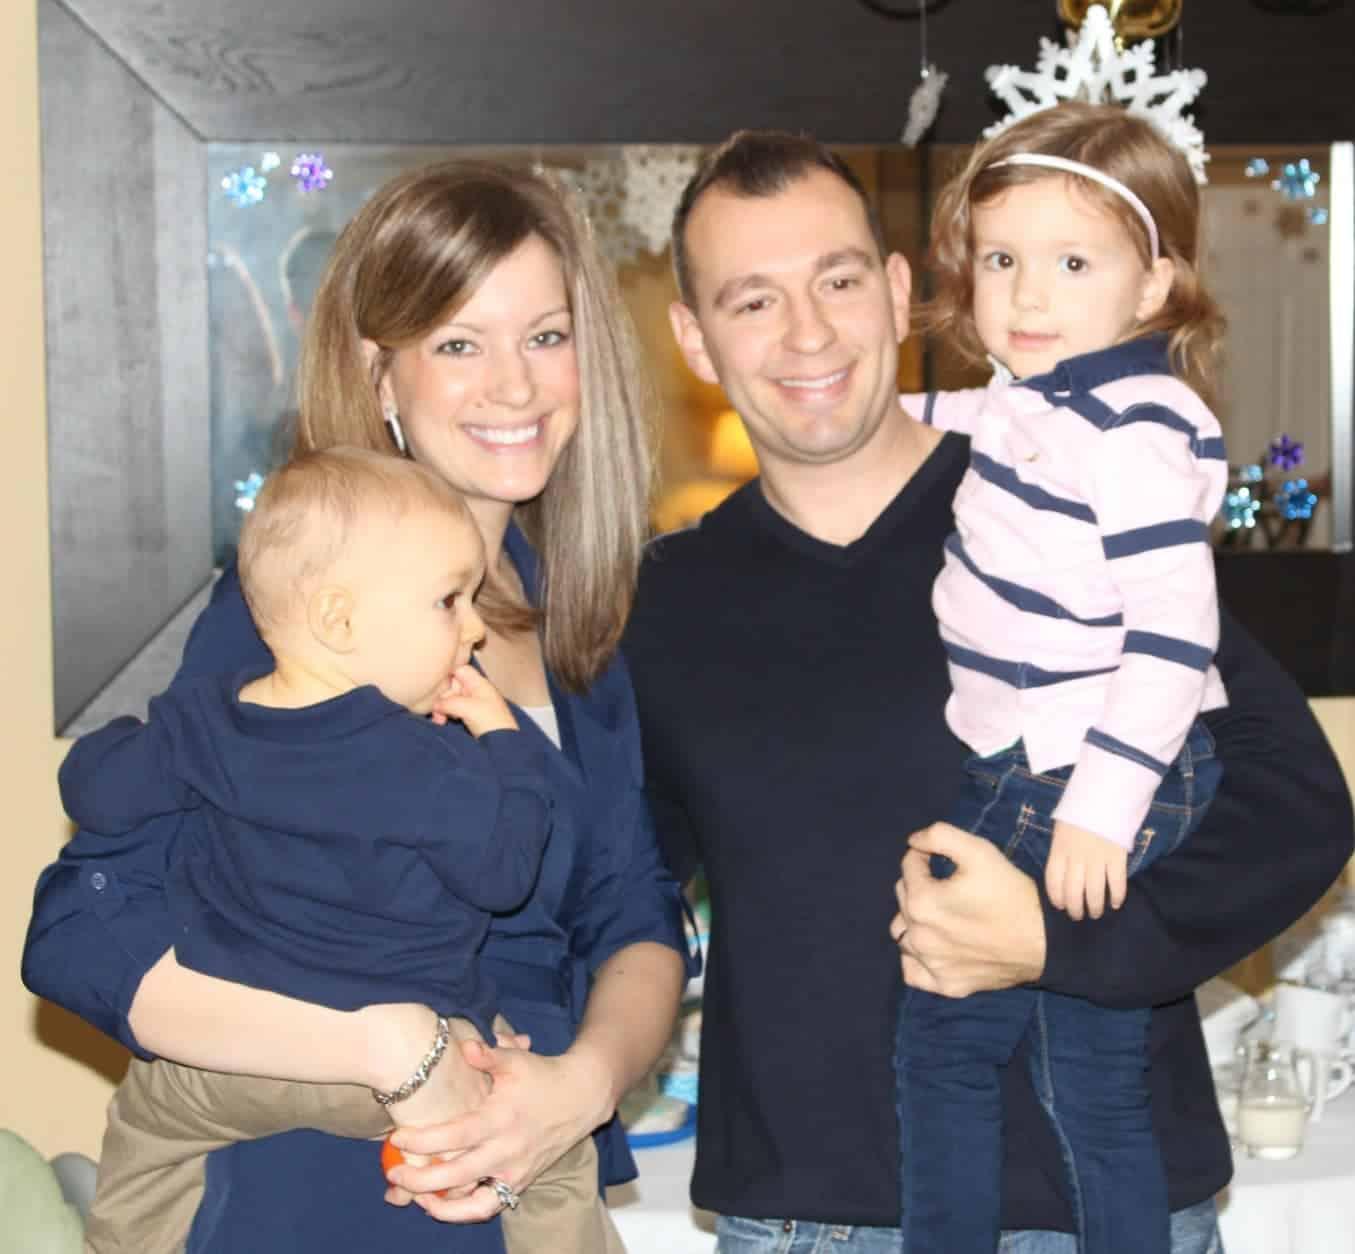 f447b2f2830a Winter ONEderland Birthday Party - Rachel Cooks®